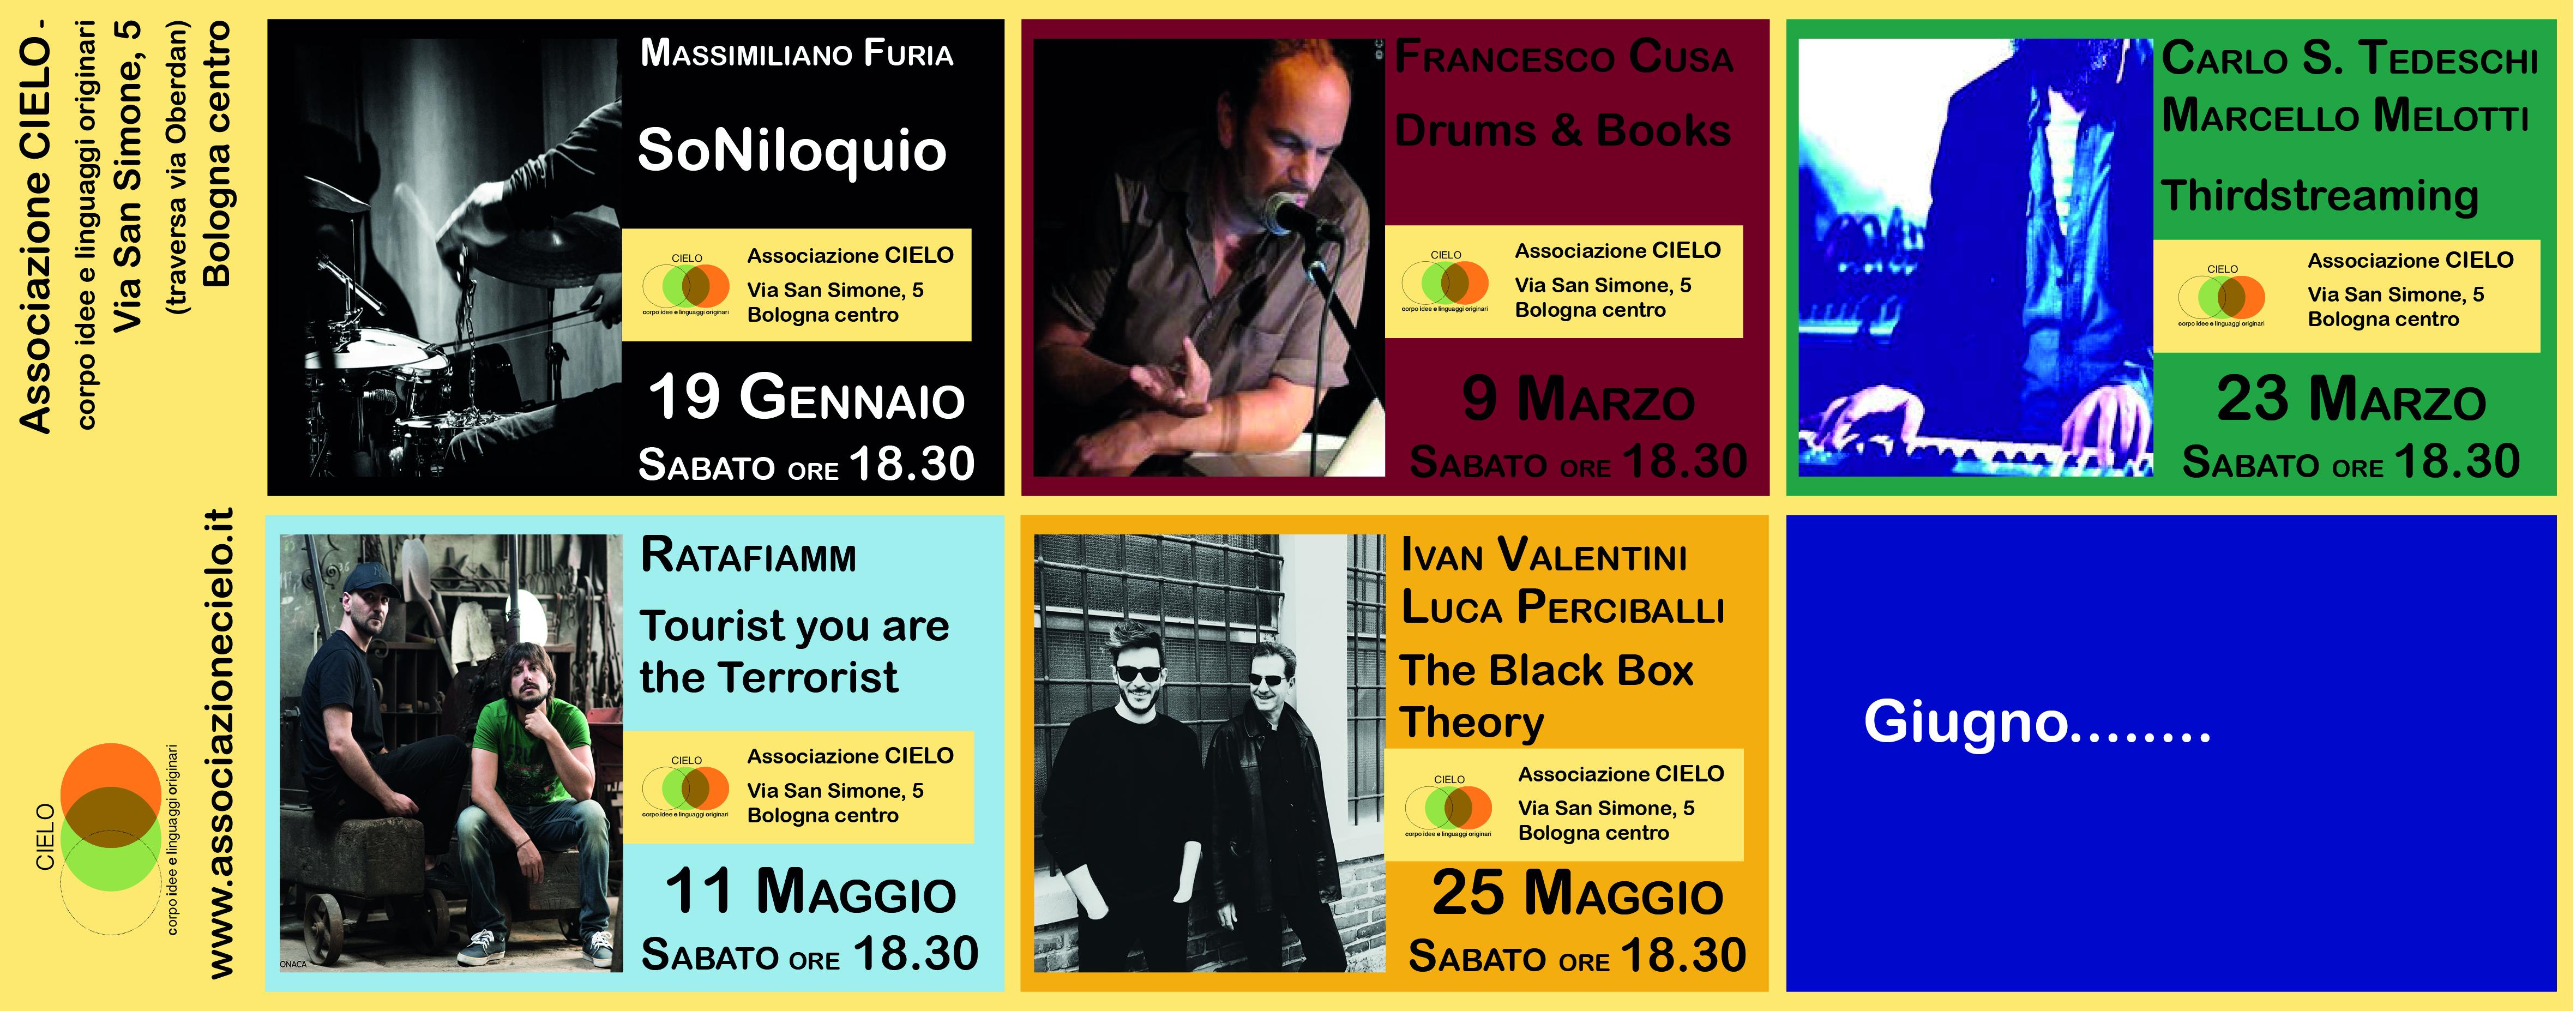 San Simone Calendario.Performance Musicale Soniloquio Con Massimiliano Furia